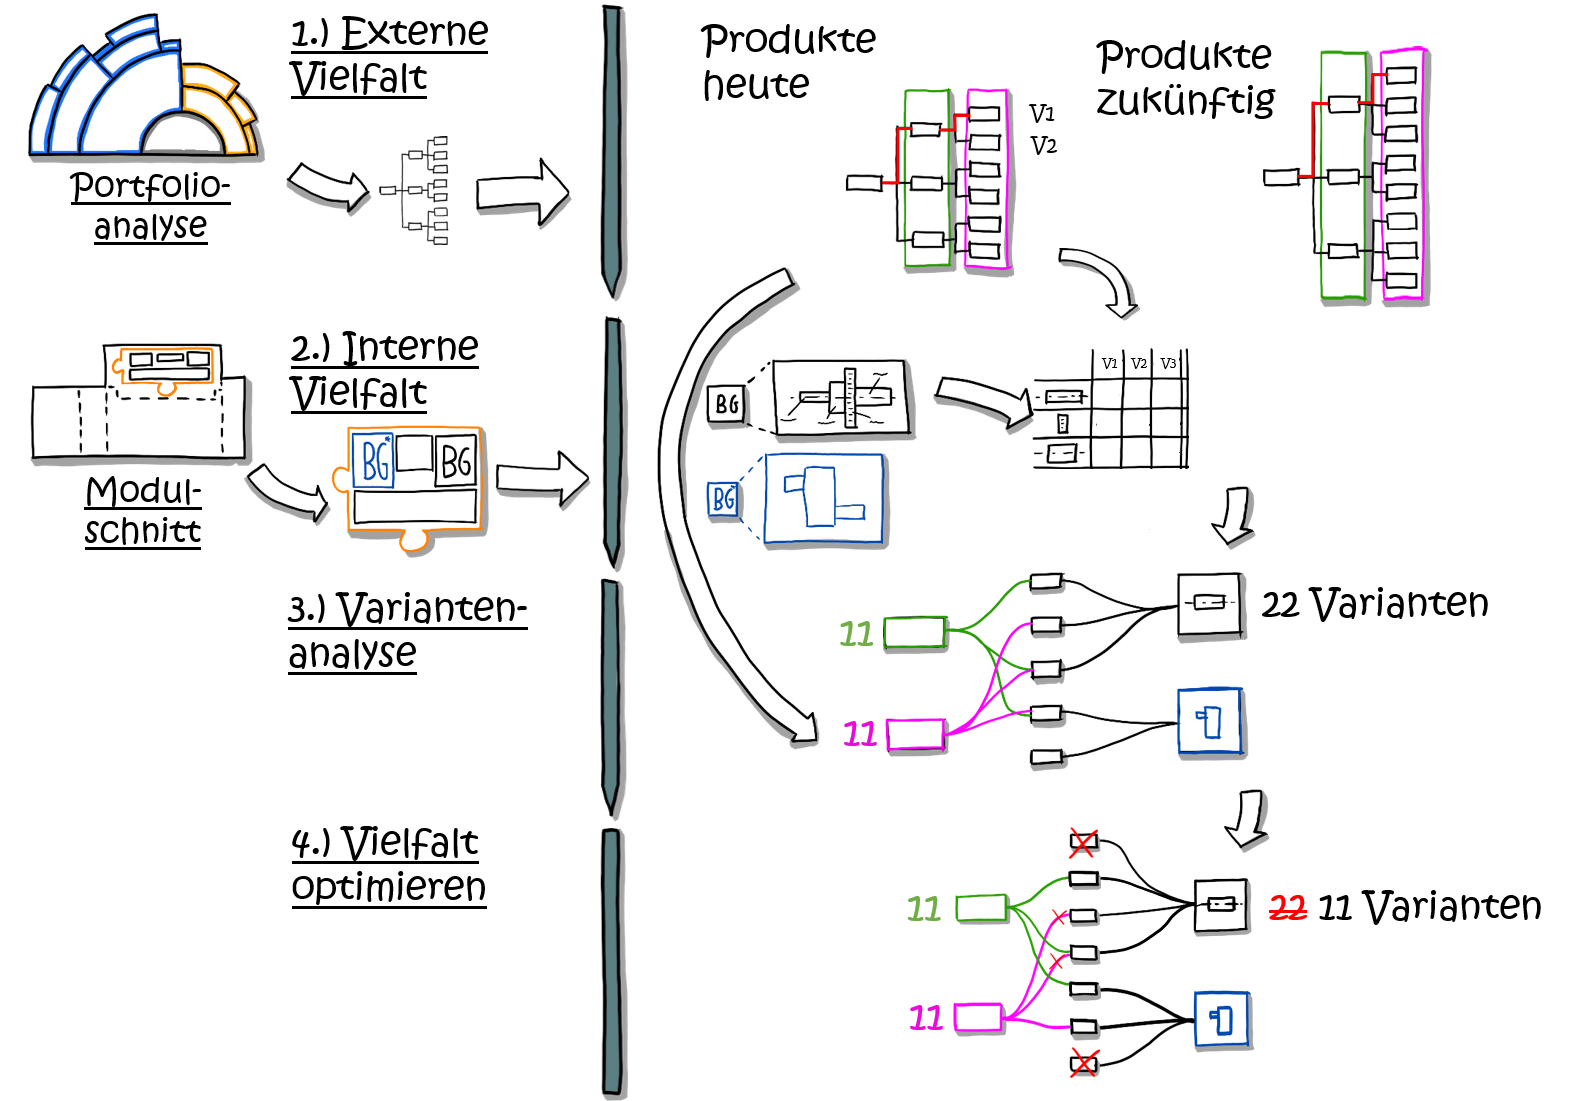 Variantenoptimierung-Methode